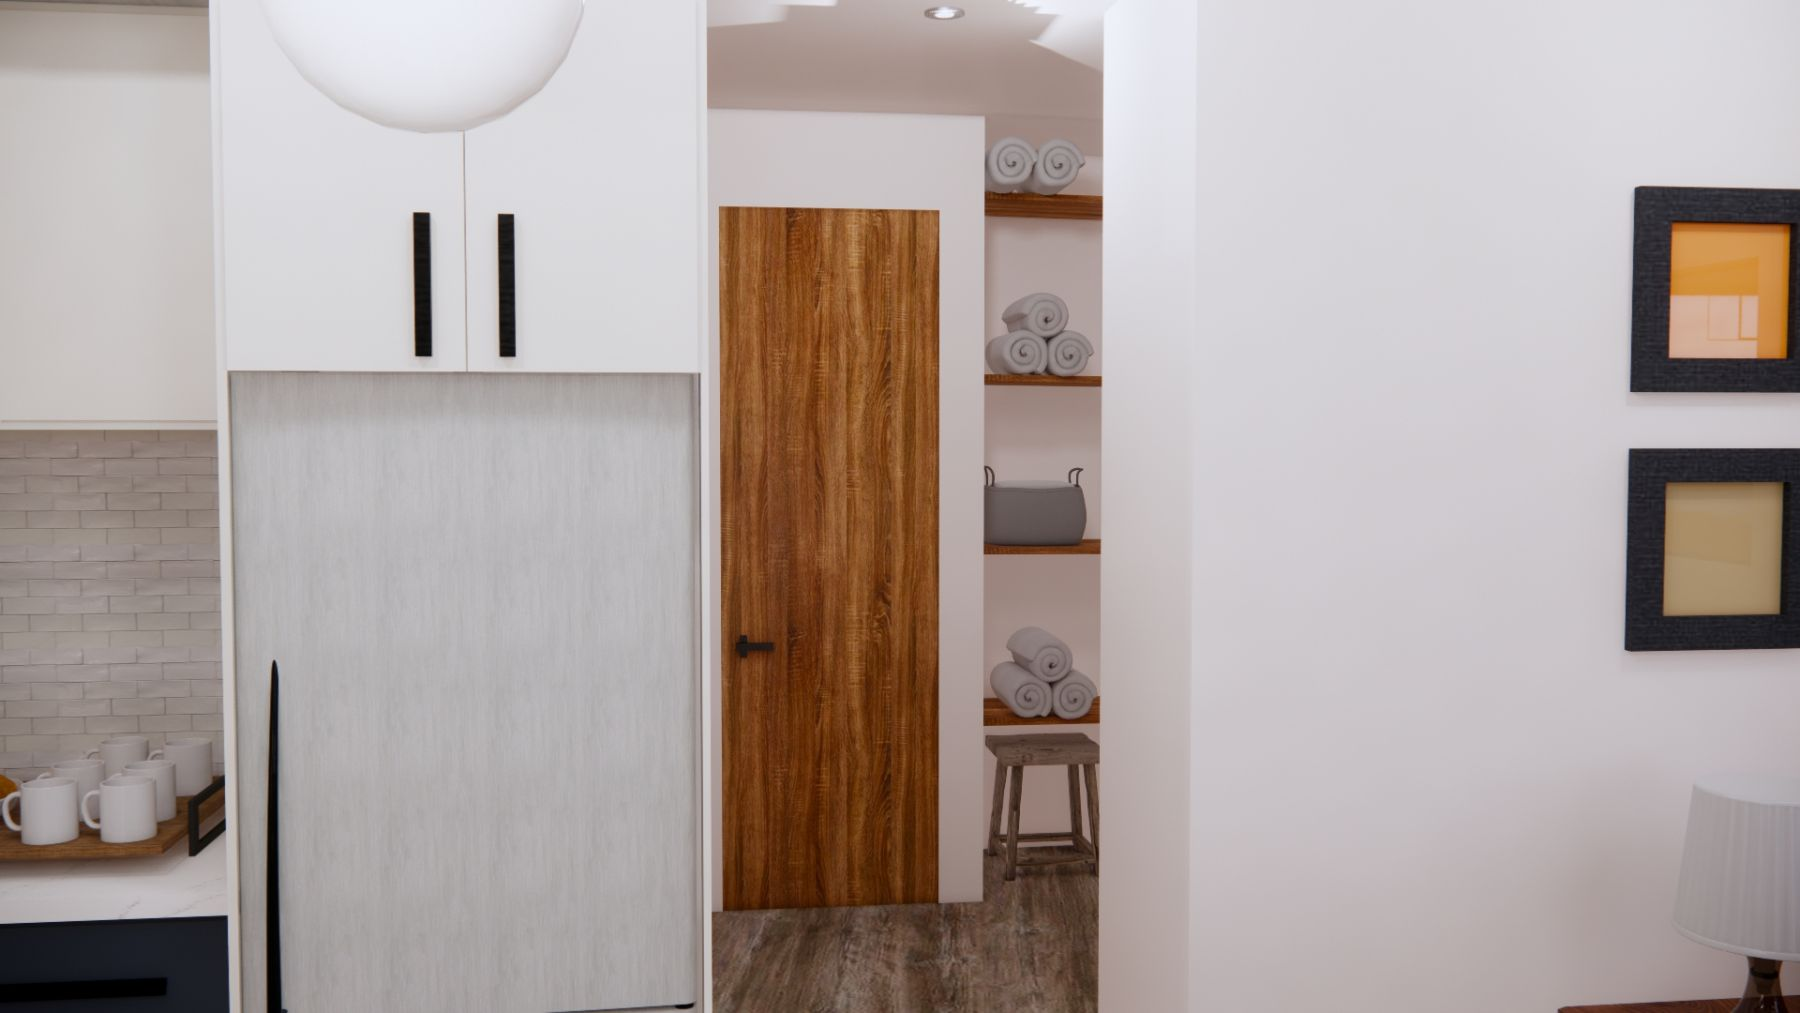 Hall-with-linen-closet